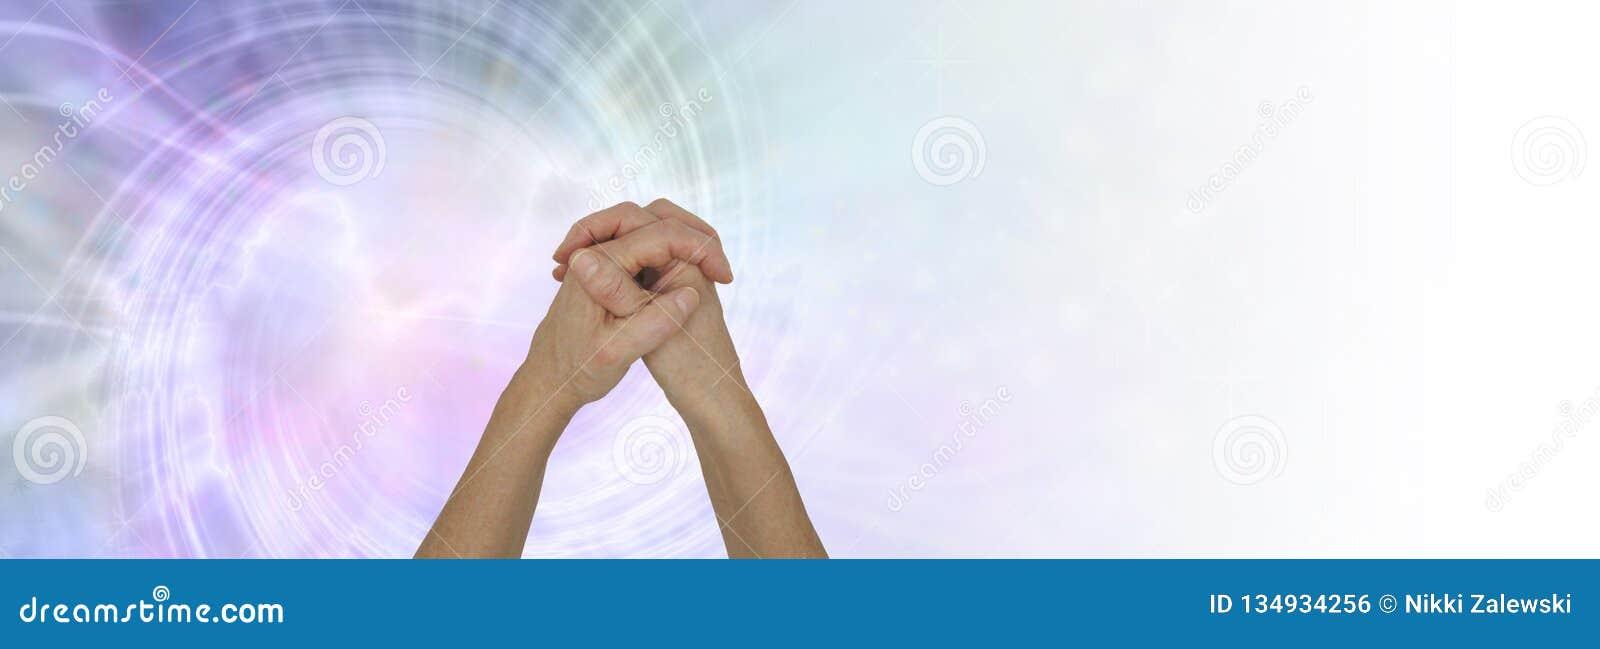 The Power of Prayer Background Banner